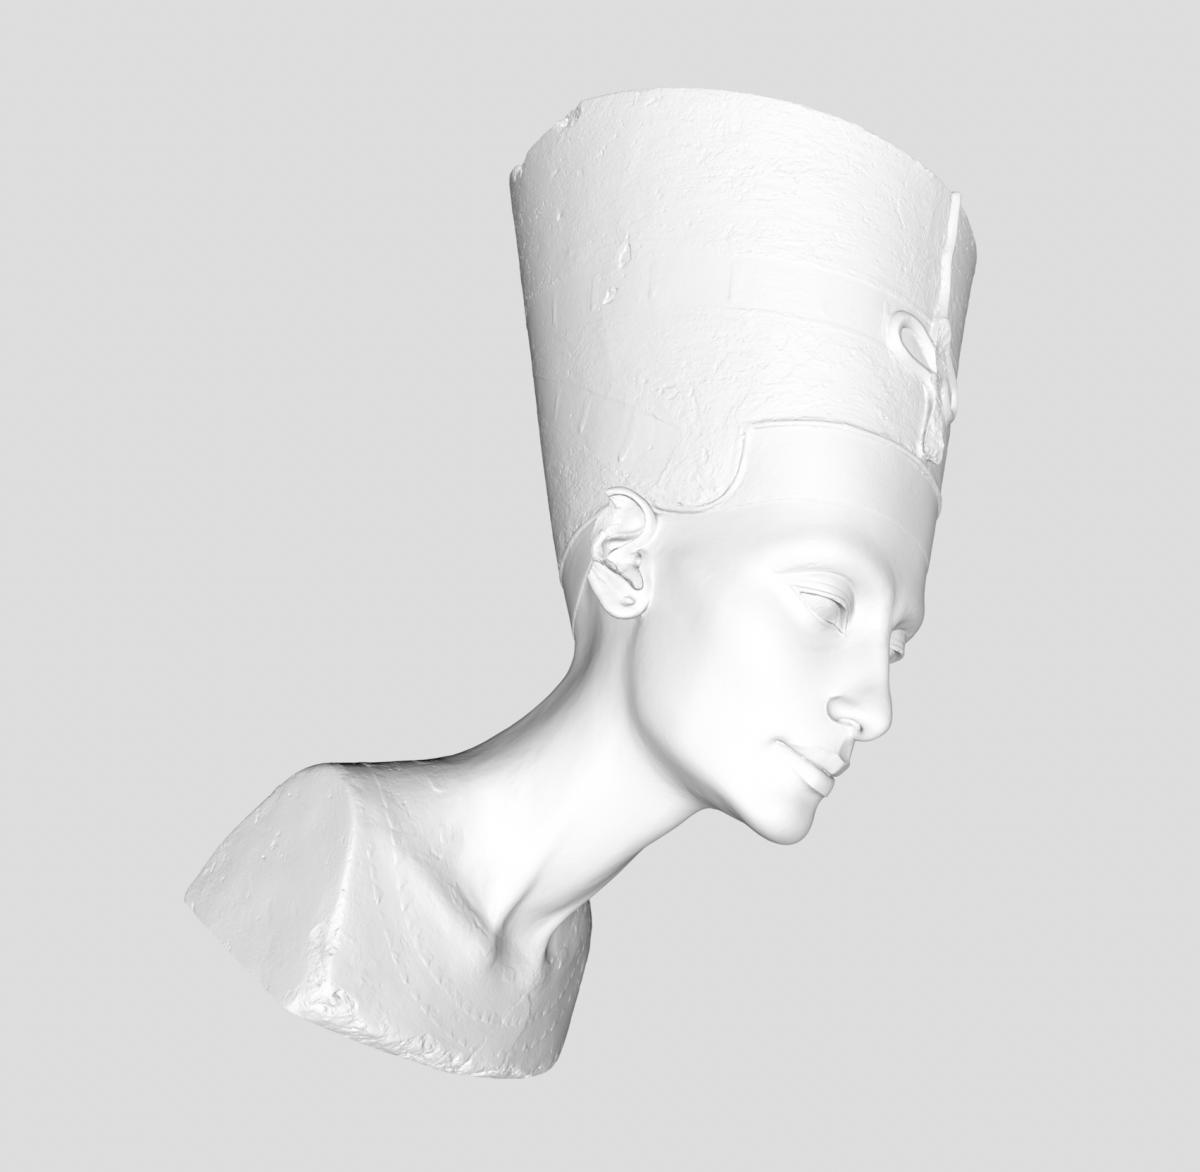 3D Scans of 7,500 Famous Sculptures, Statues & Artworks: Download